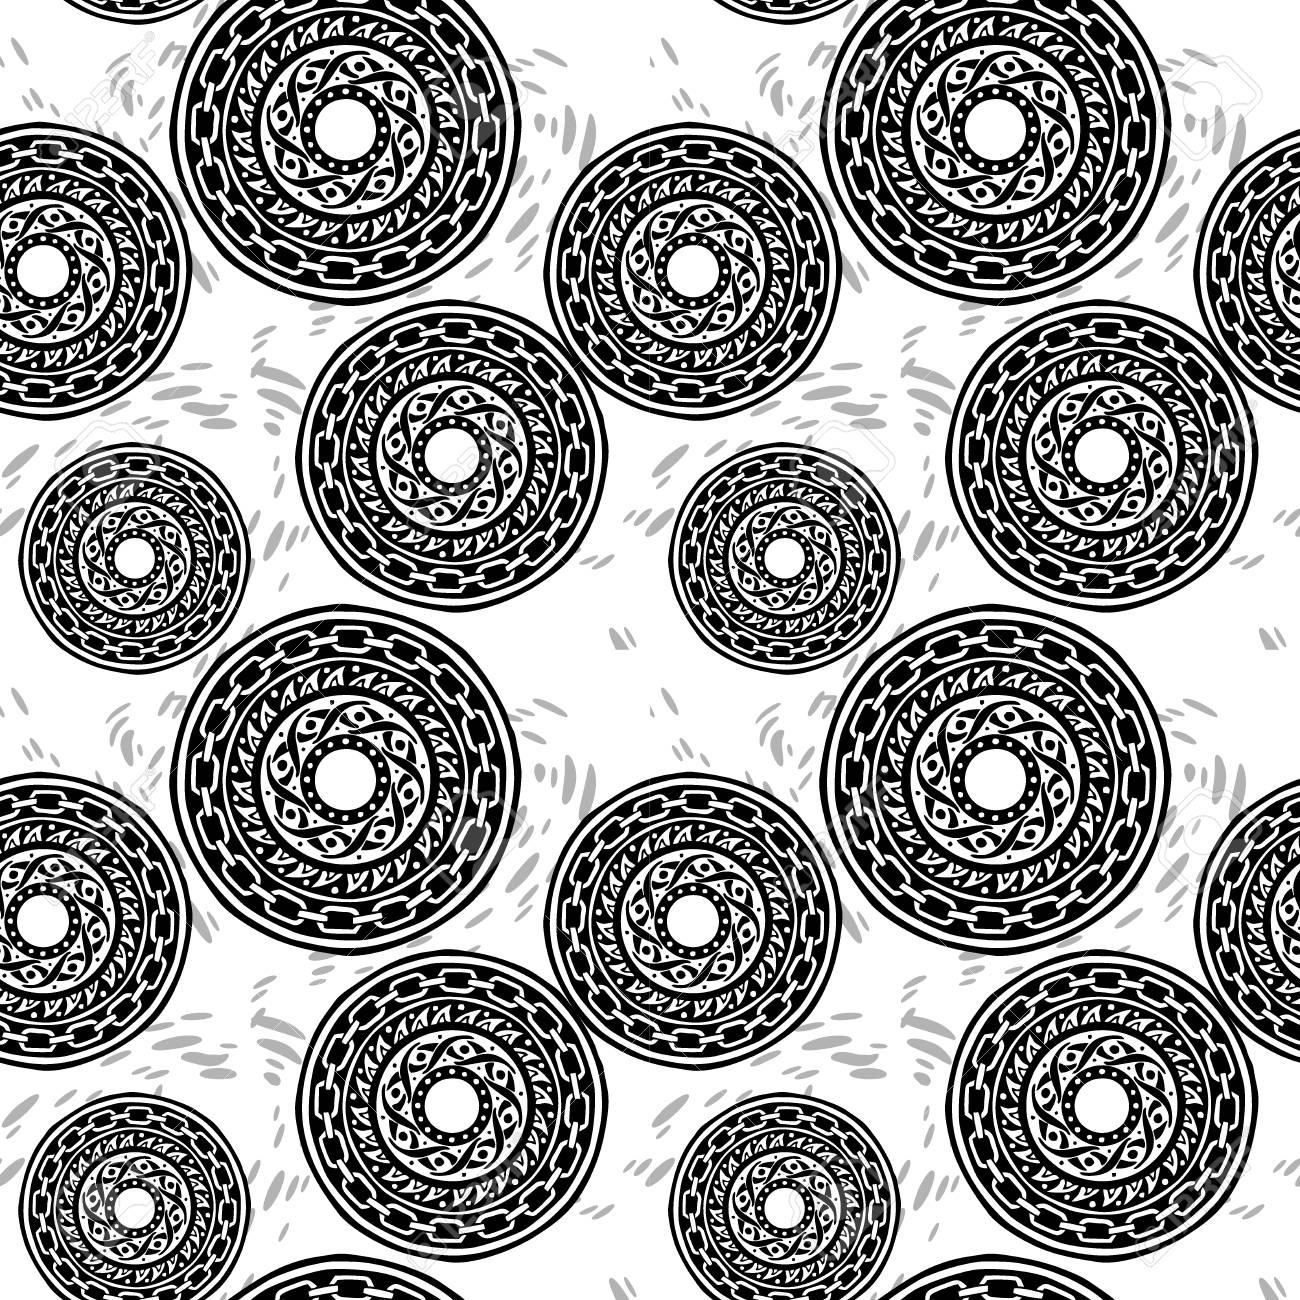 77e279f2e72f6 motif black and white barbaric circle wheel tribal chain tattoo seamless  pattern vector background Stock Vector